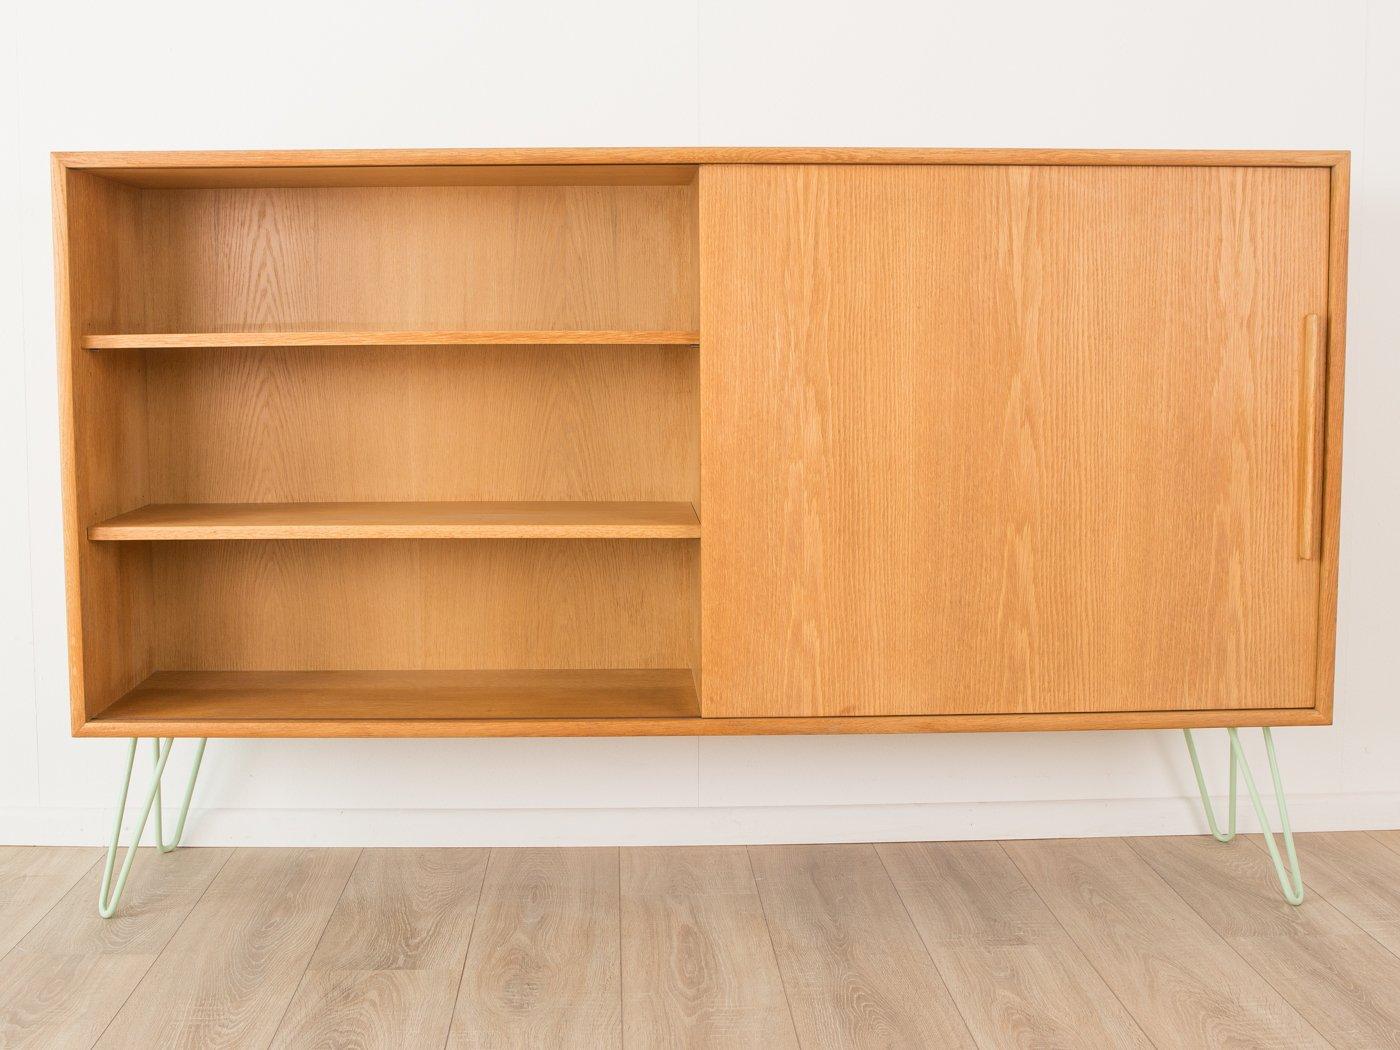 oak veneer sideboard from wk m bel 1960s en vente sur pamono. Black Bedroom Furniture Sets. Home Design Ideas